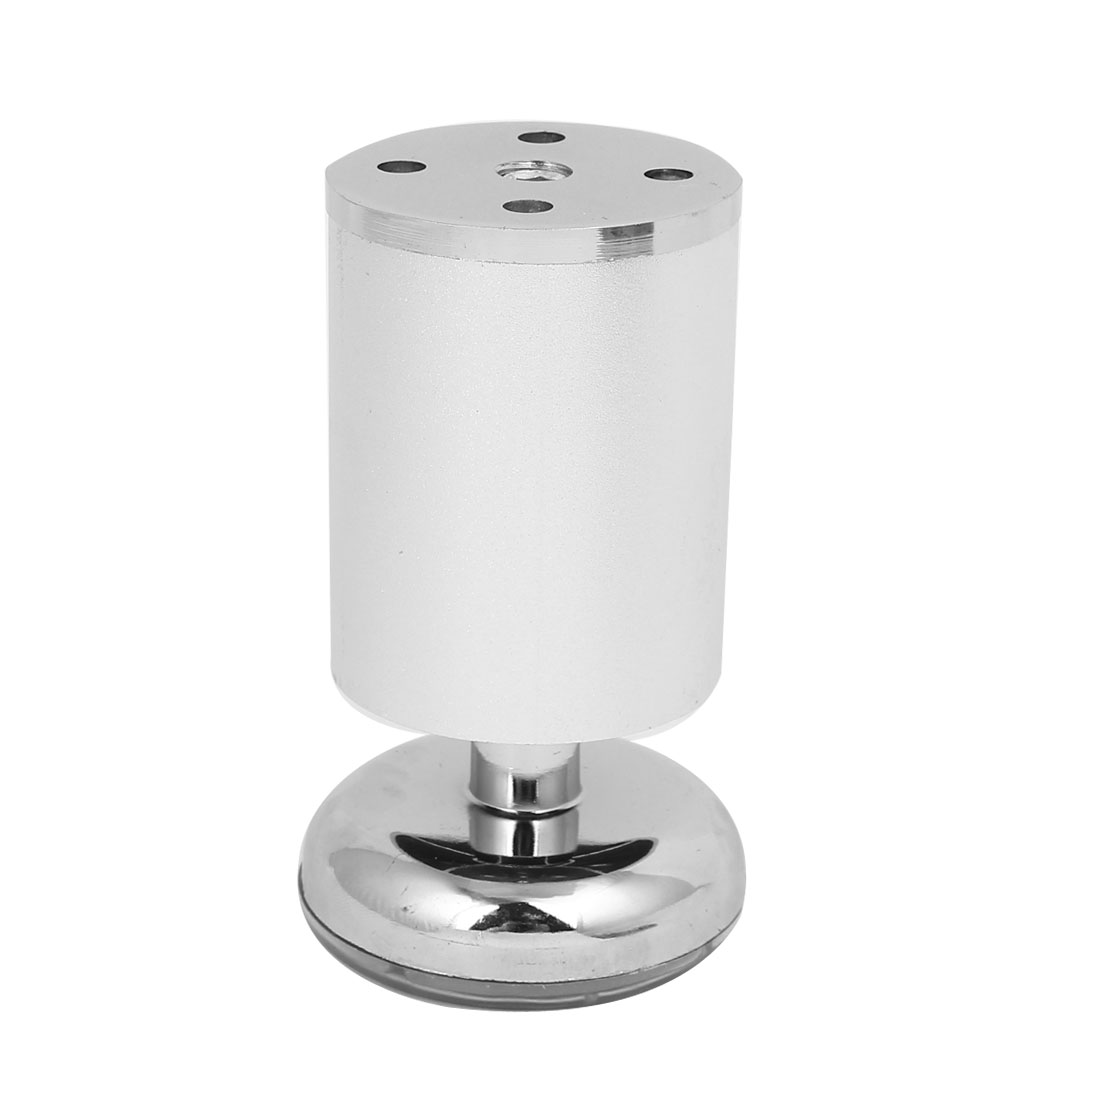 Cupboard Cabinet Metal Round Stand Adjustable Leg Feet Silver Tone ...